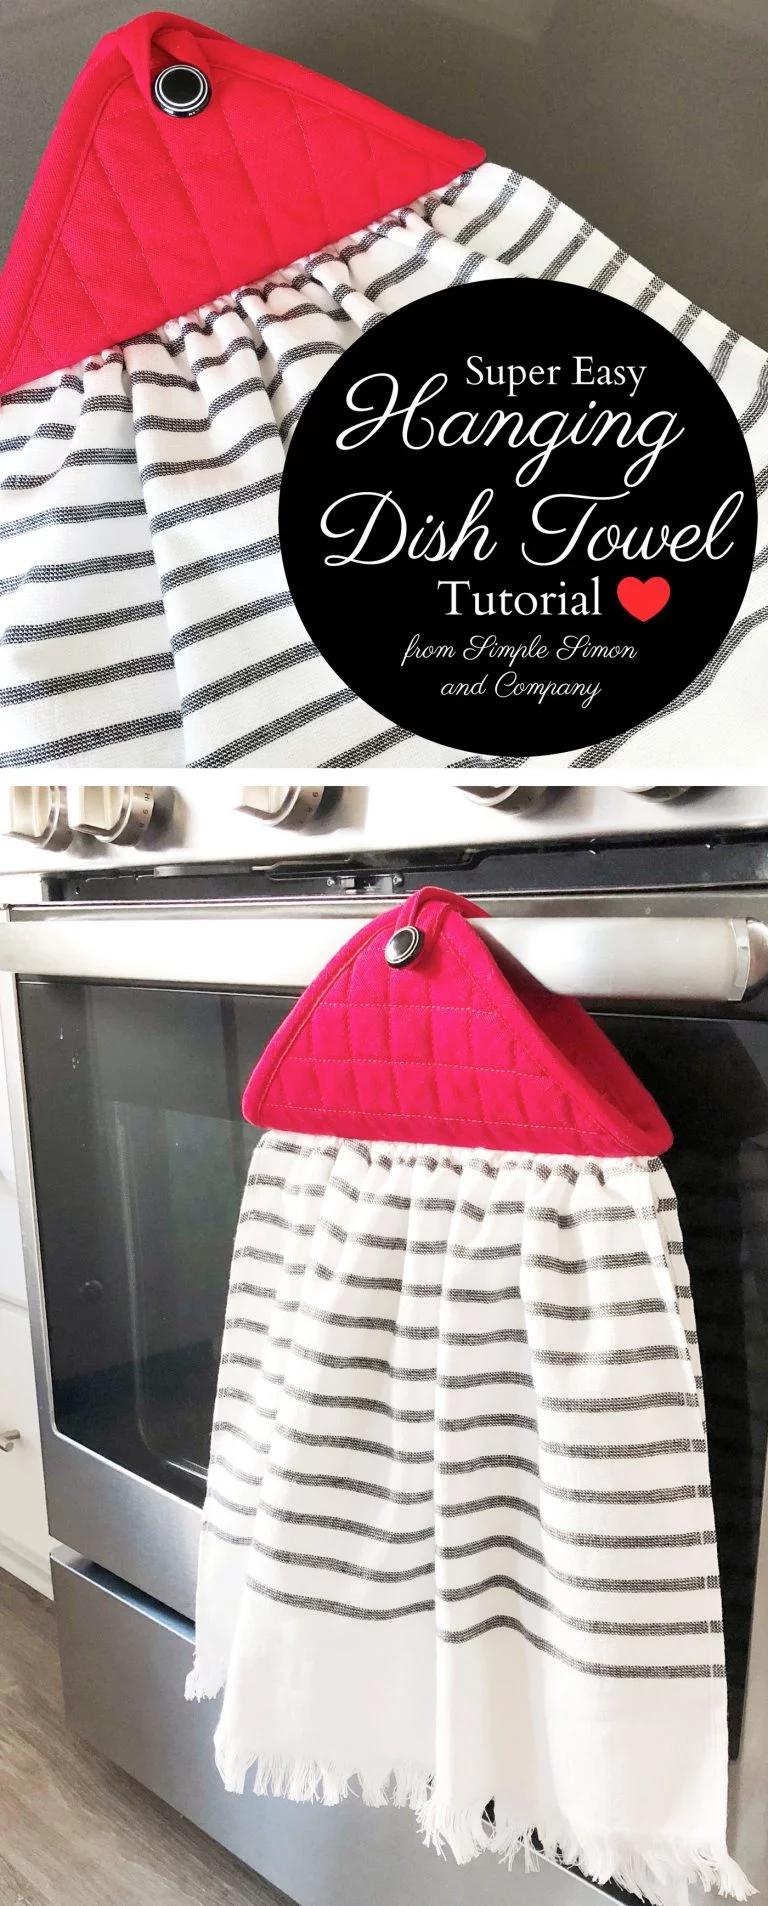 Farmhouse Style Hanging Kitchen Towel Tutorial #dishtowels